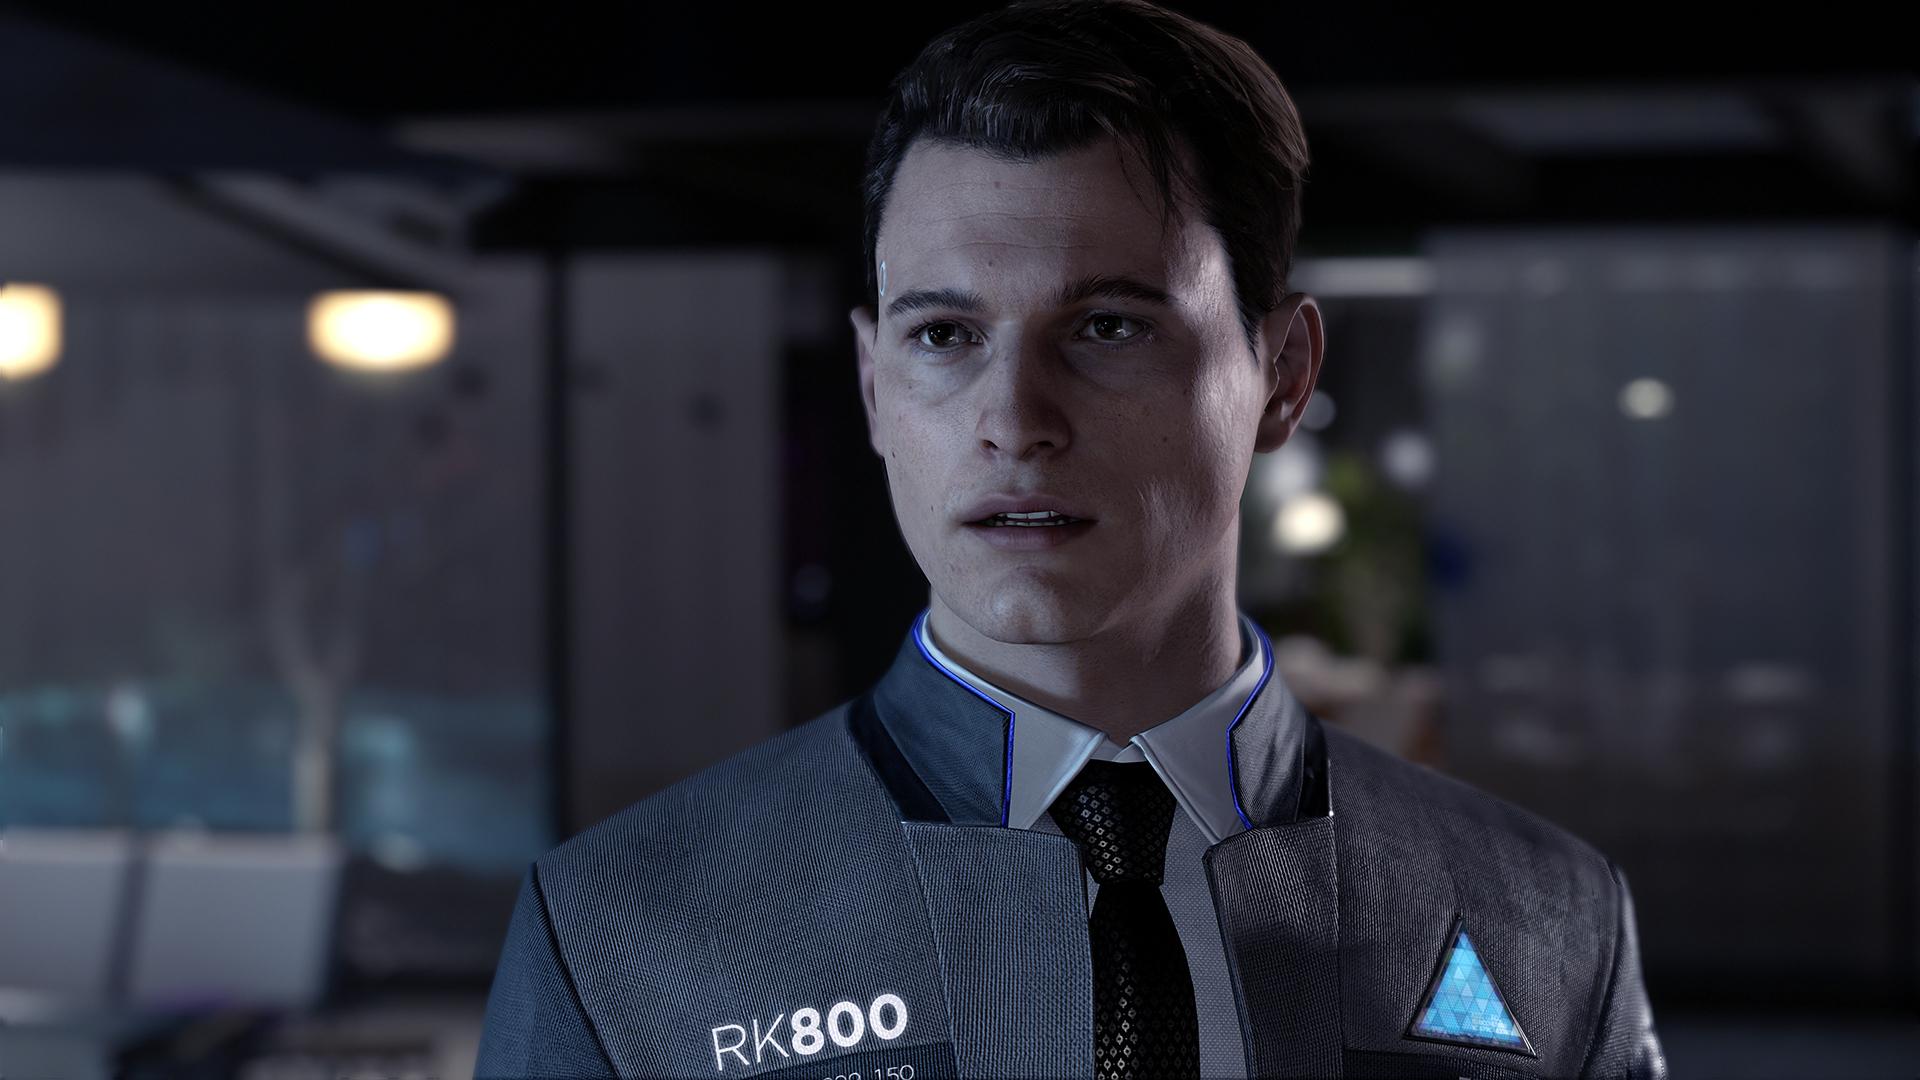 detroit become human ps4 emulator